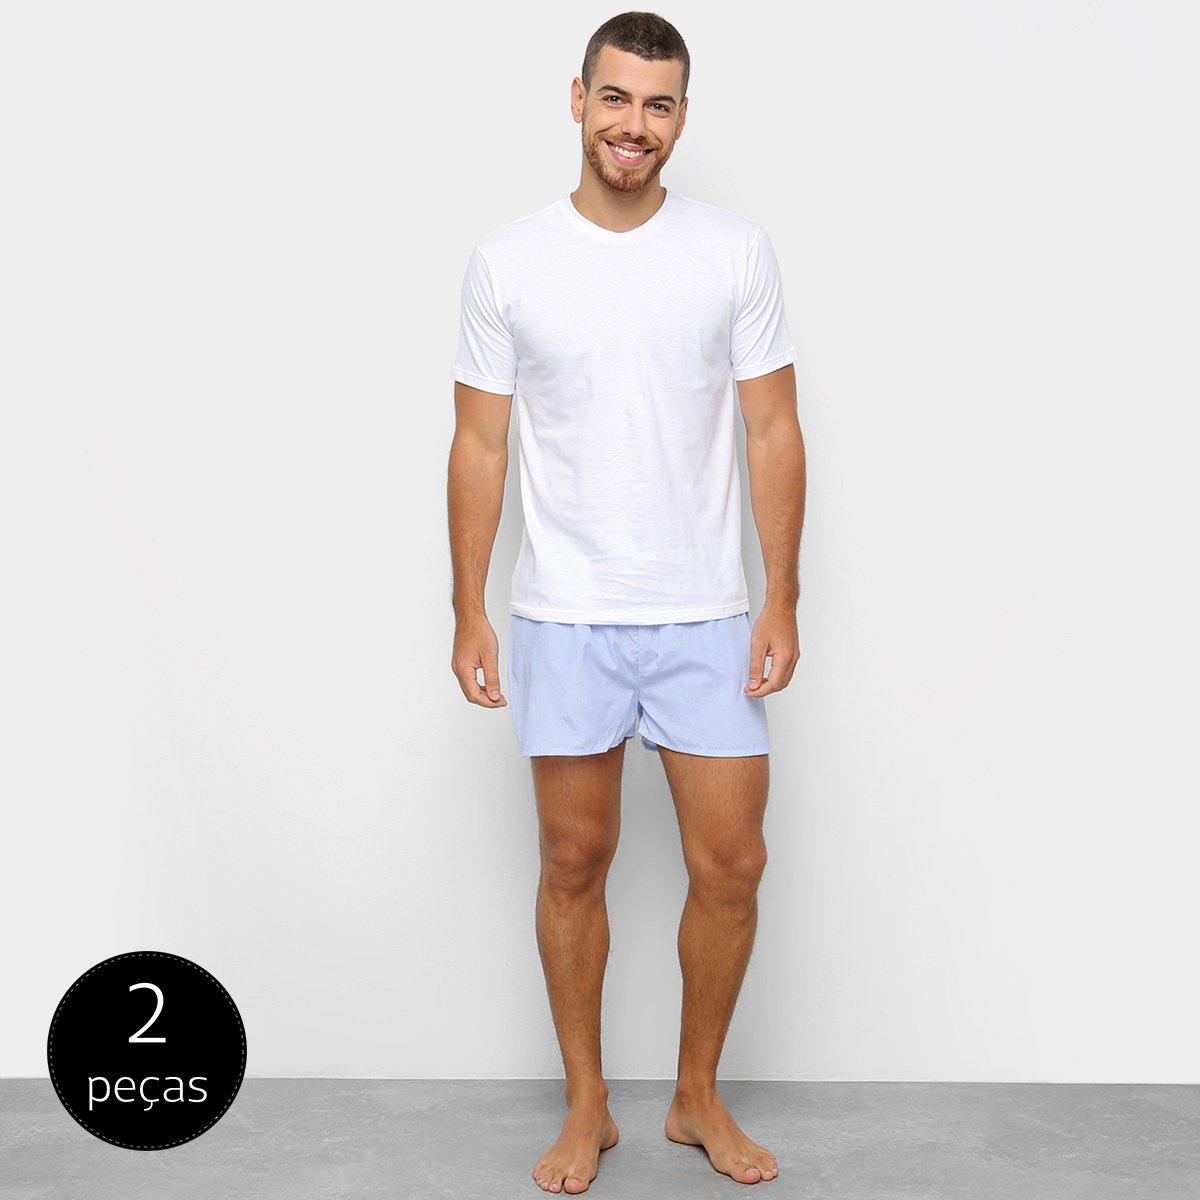 33f68aa491a703 Conjunto de Pijama Duomo 2 Peças Liso Masculino - Tam: M - Shopping ...